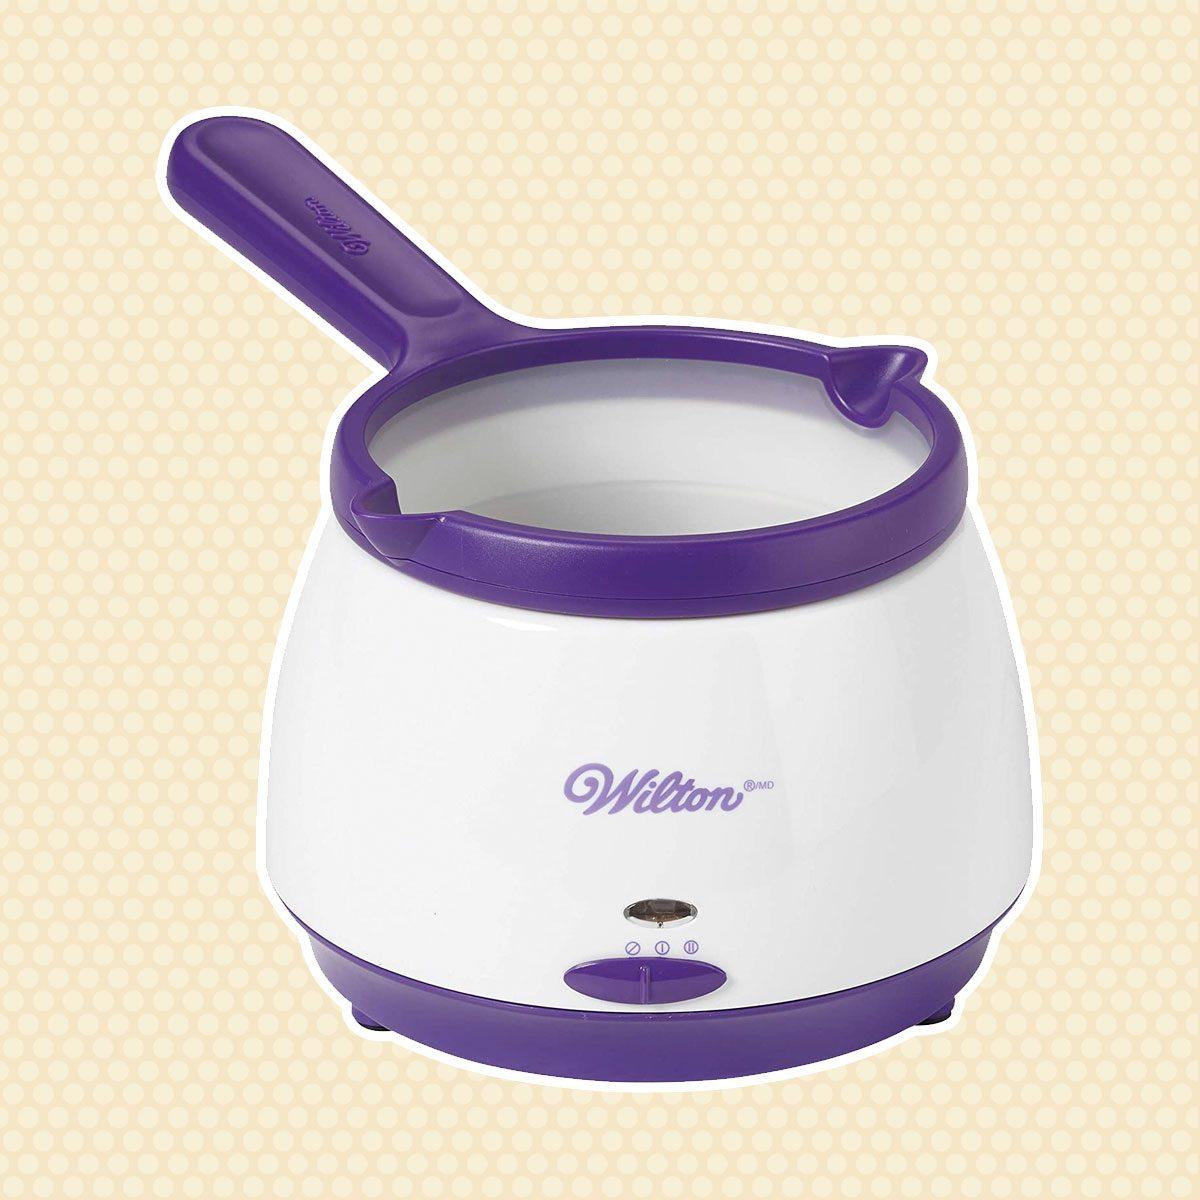 Wilton Candy Melts Pot, 2.5 Cups, White